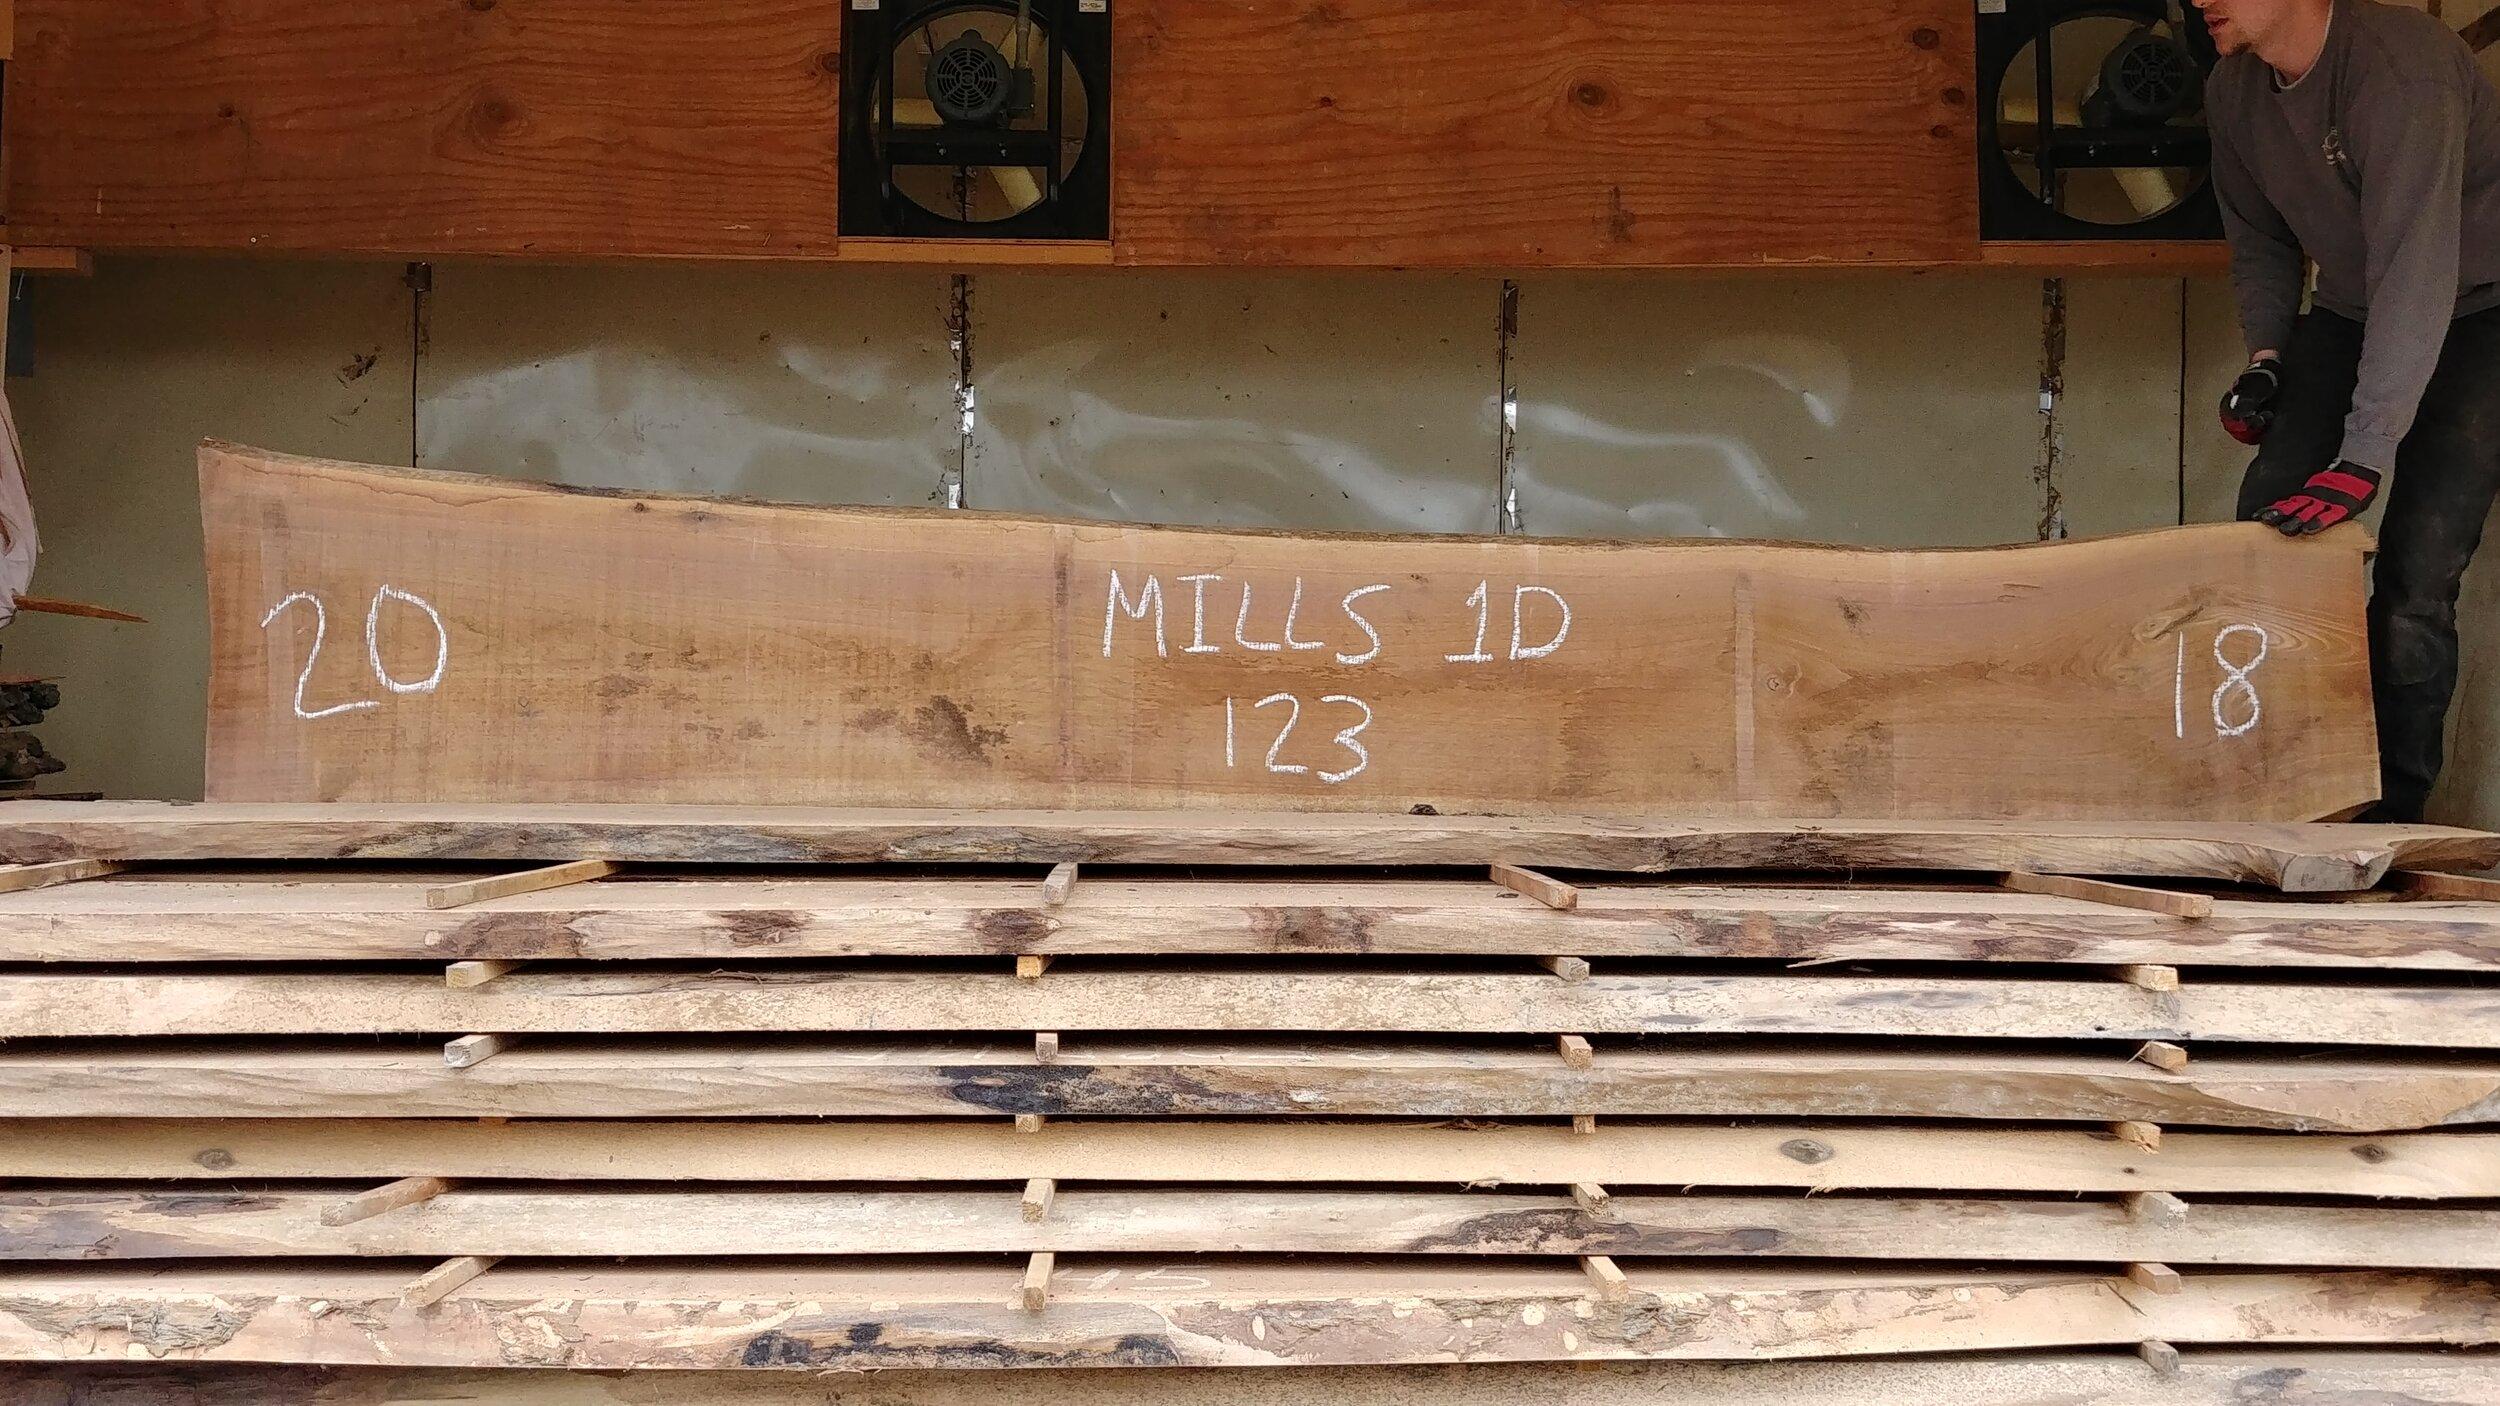 Mills 1D.jpg